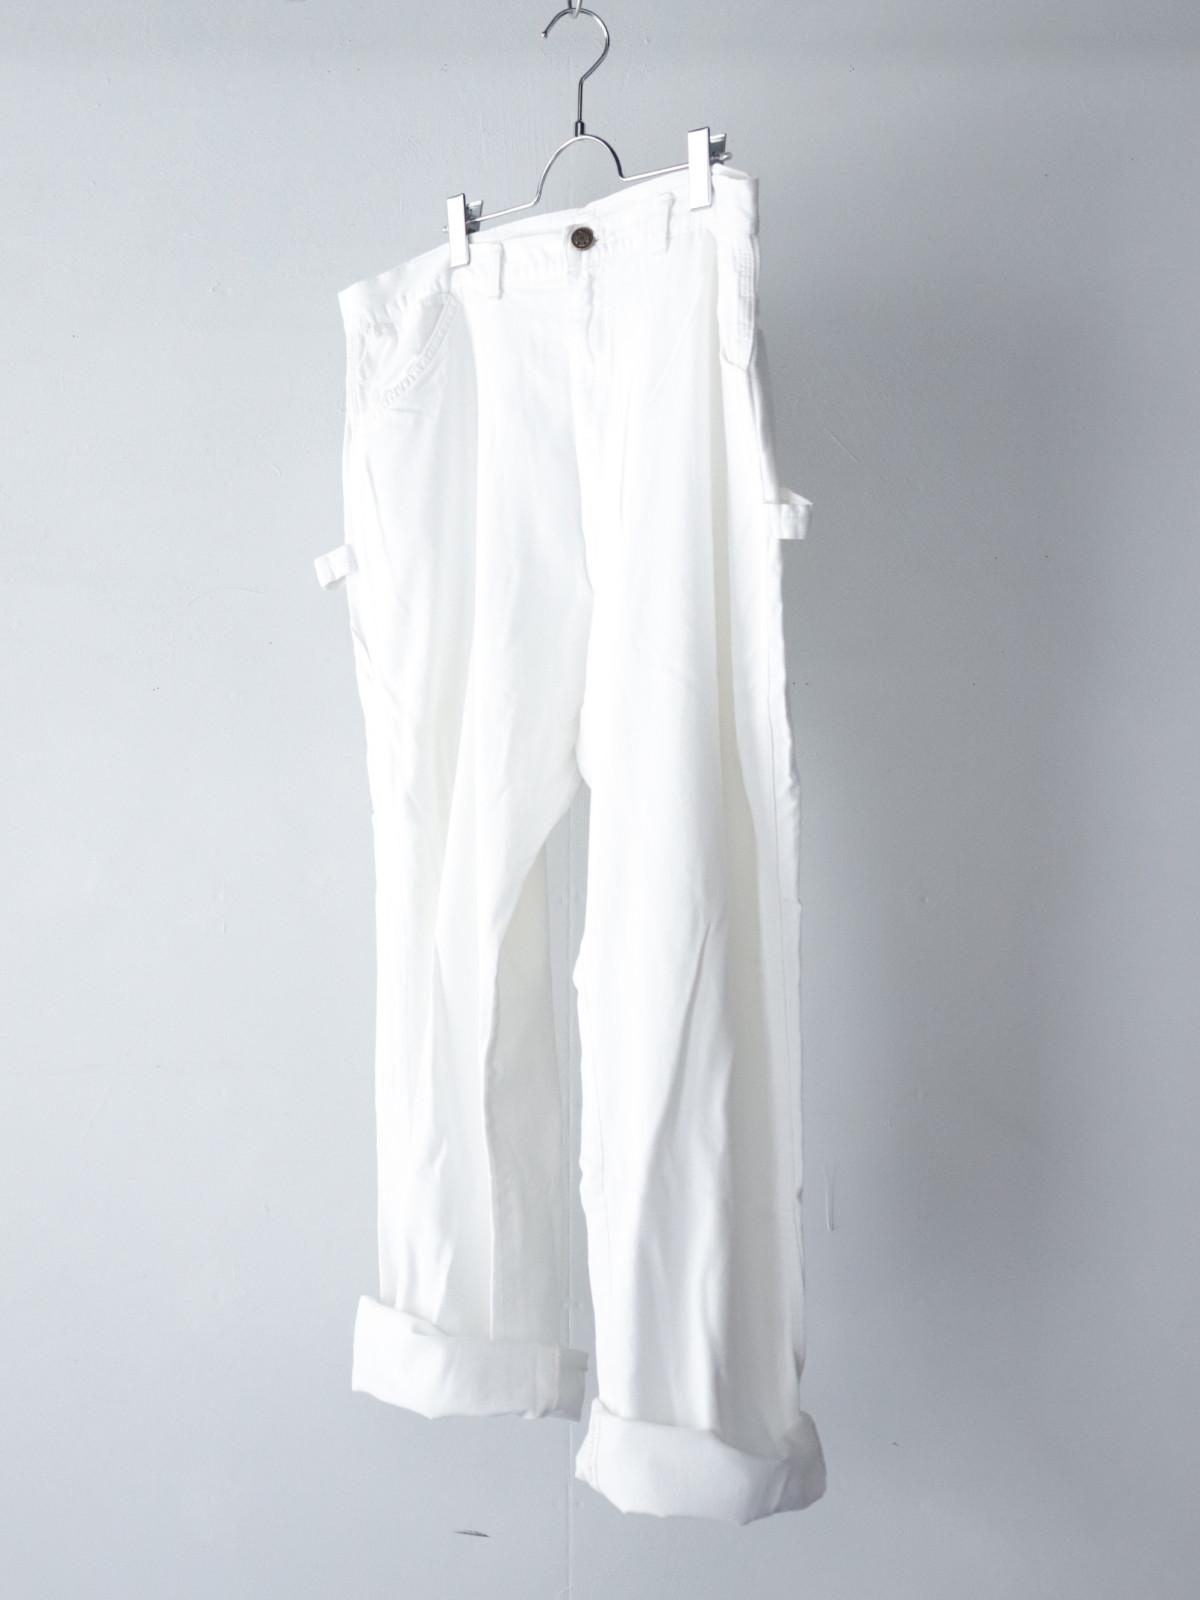 DEECEE, painter pants, USA